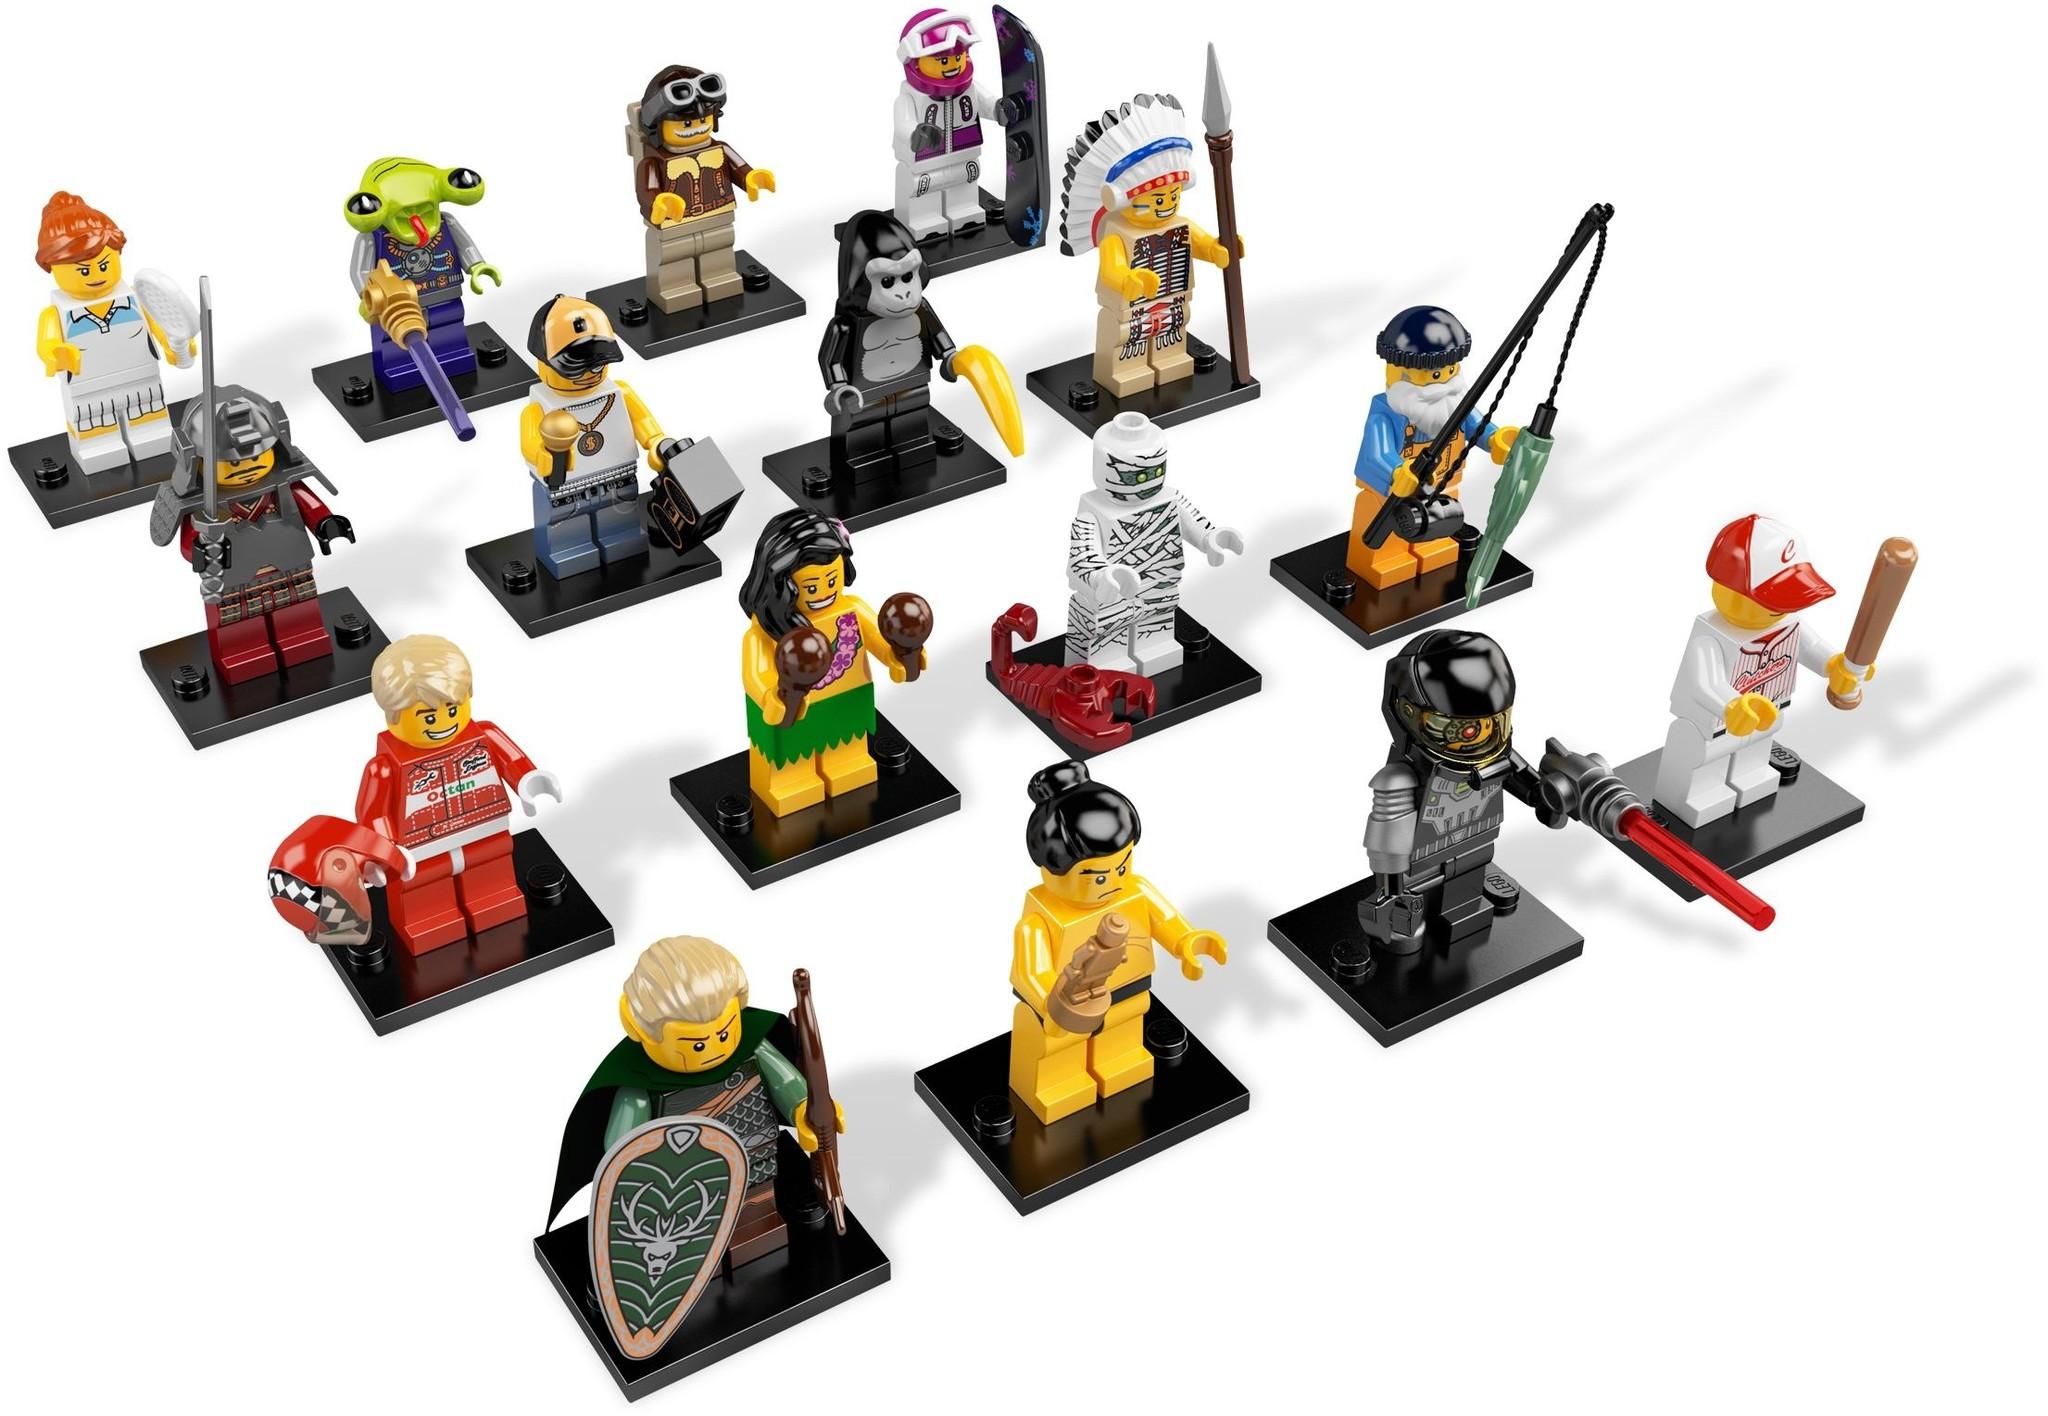 LEGO 8803 - LEGO Minifigures Series 3 Complete Full Set (16 pcs) MISP